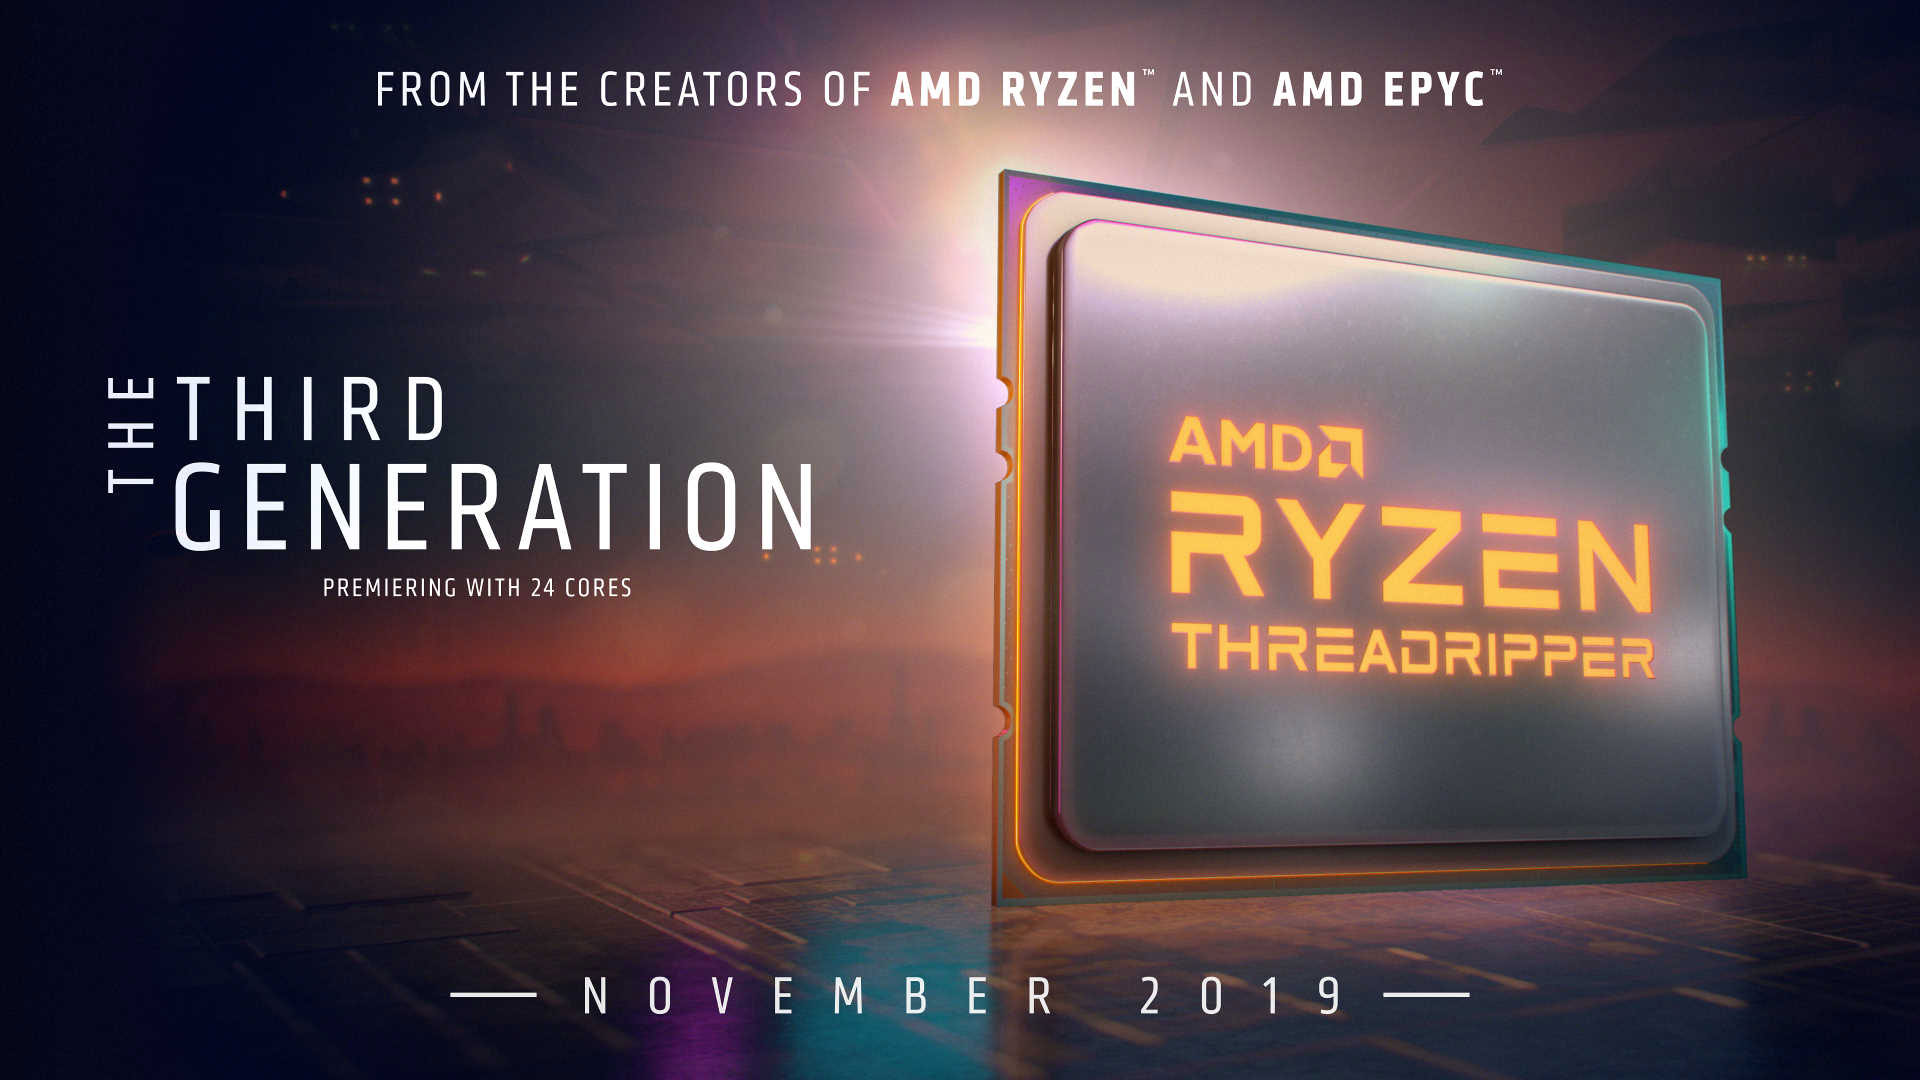 AMD's 16-core Ryzen 9 3950X and 3rd-gen Threadripper CPUs land in November | PC Gamer